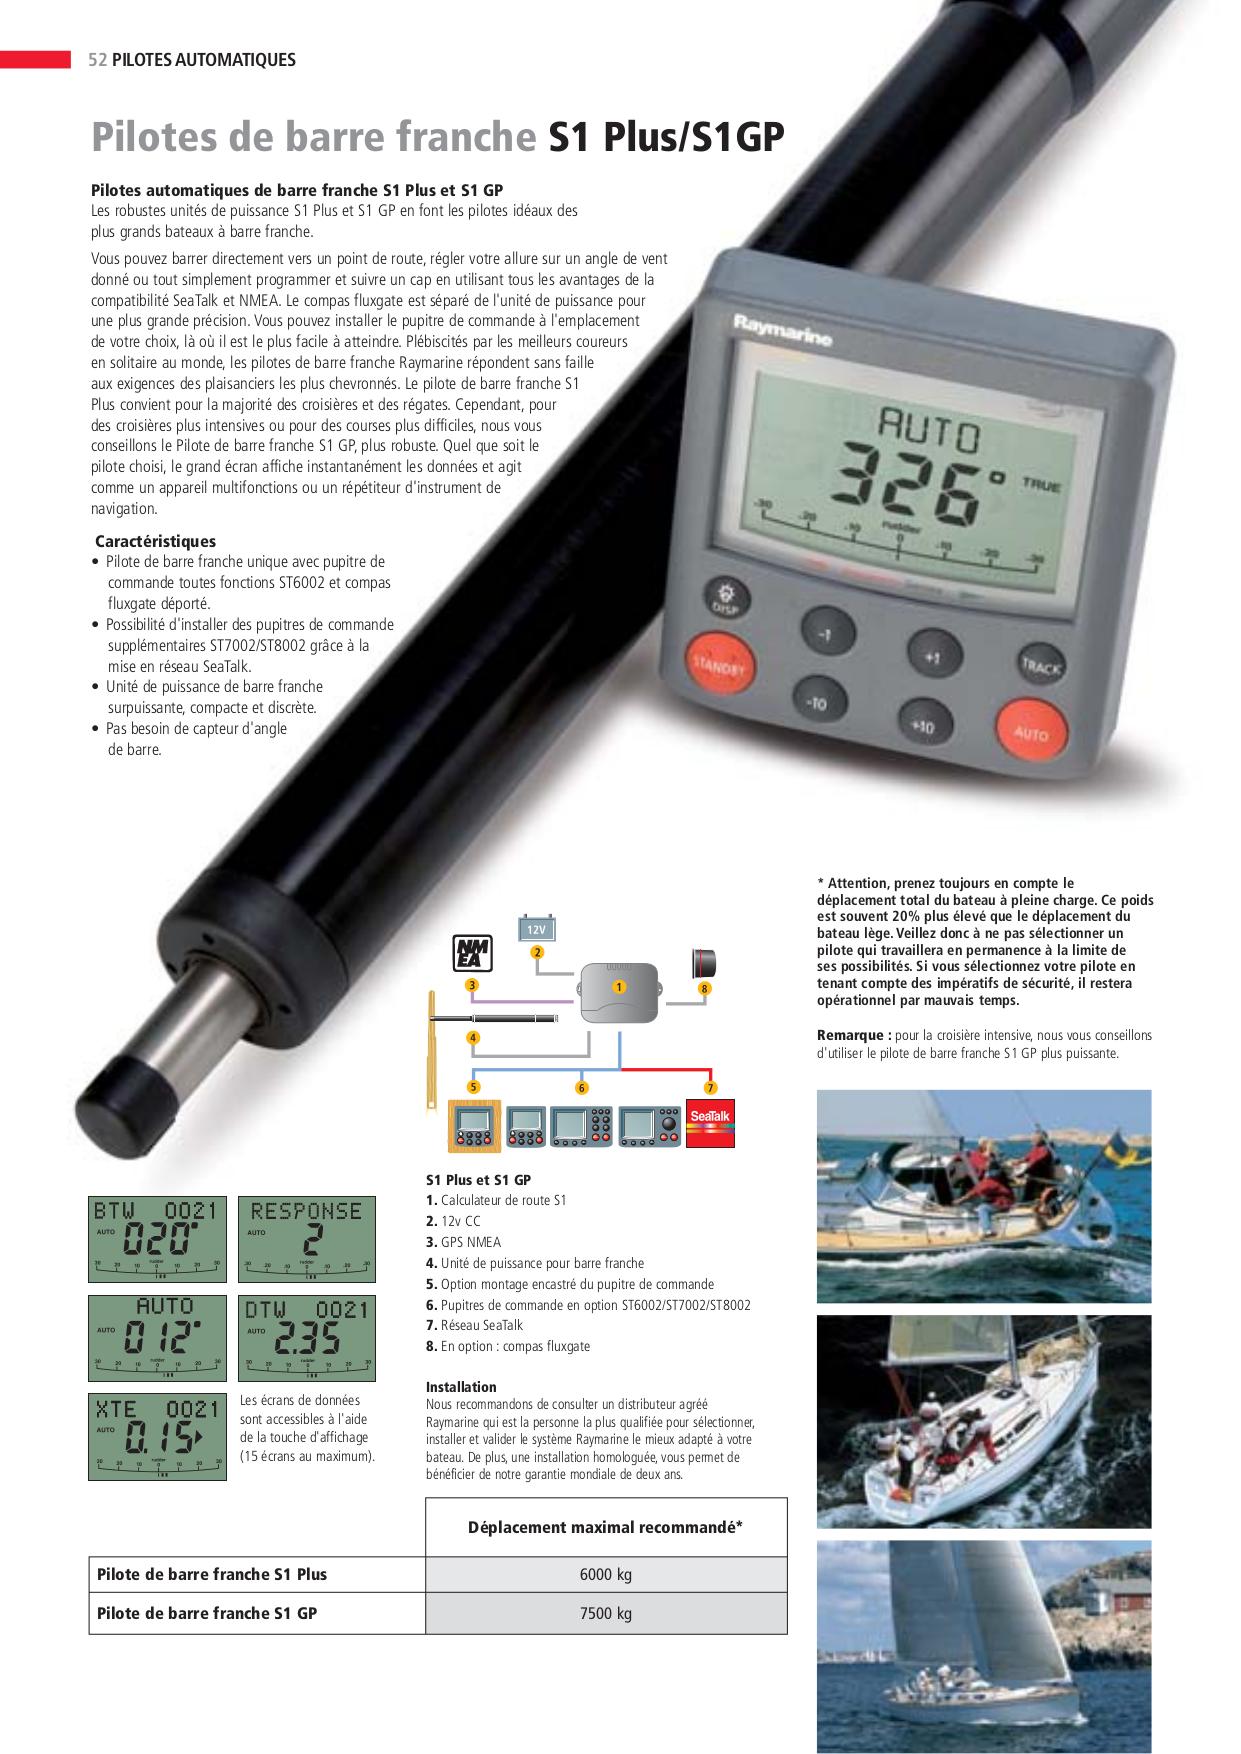 pdf manual for raymarine gps autohelm st5000 rh umlib com Raymarine Autohelm 4000 raymarine st5000+autopilot manual